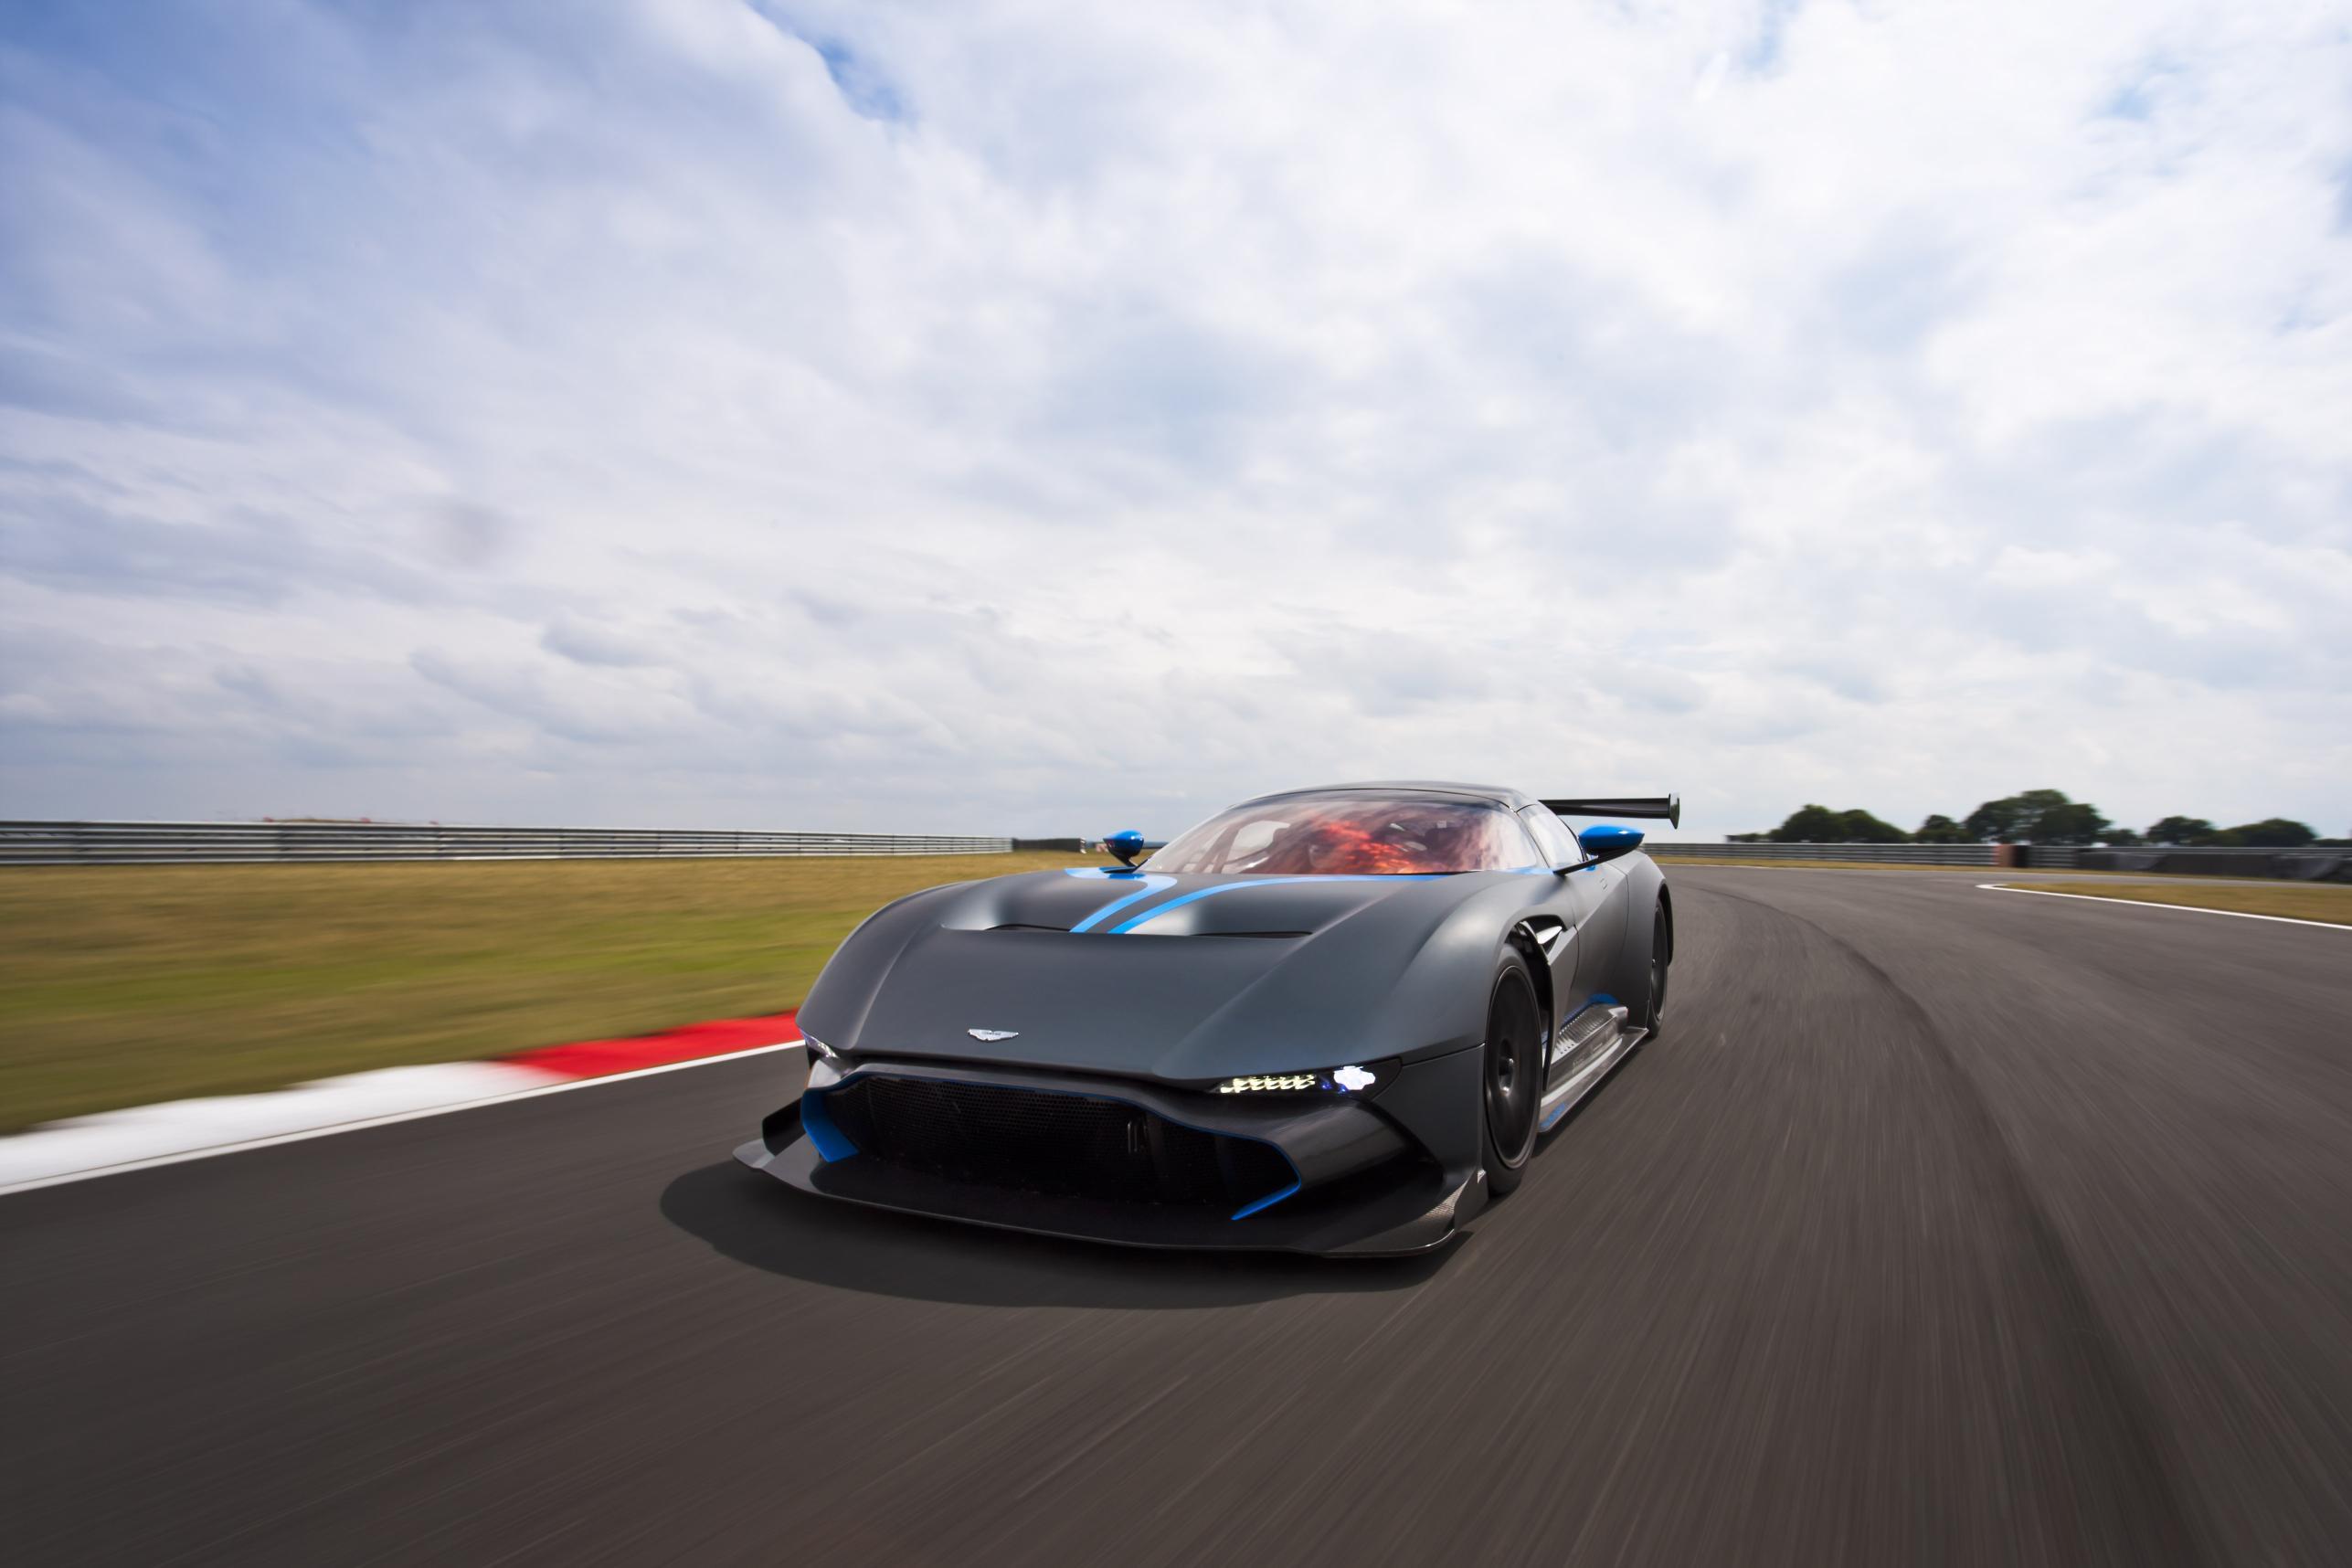 Aston Martin Vulcan To Open 24 Hours Of Spa Race Gtspirit